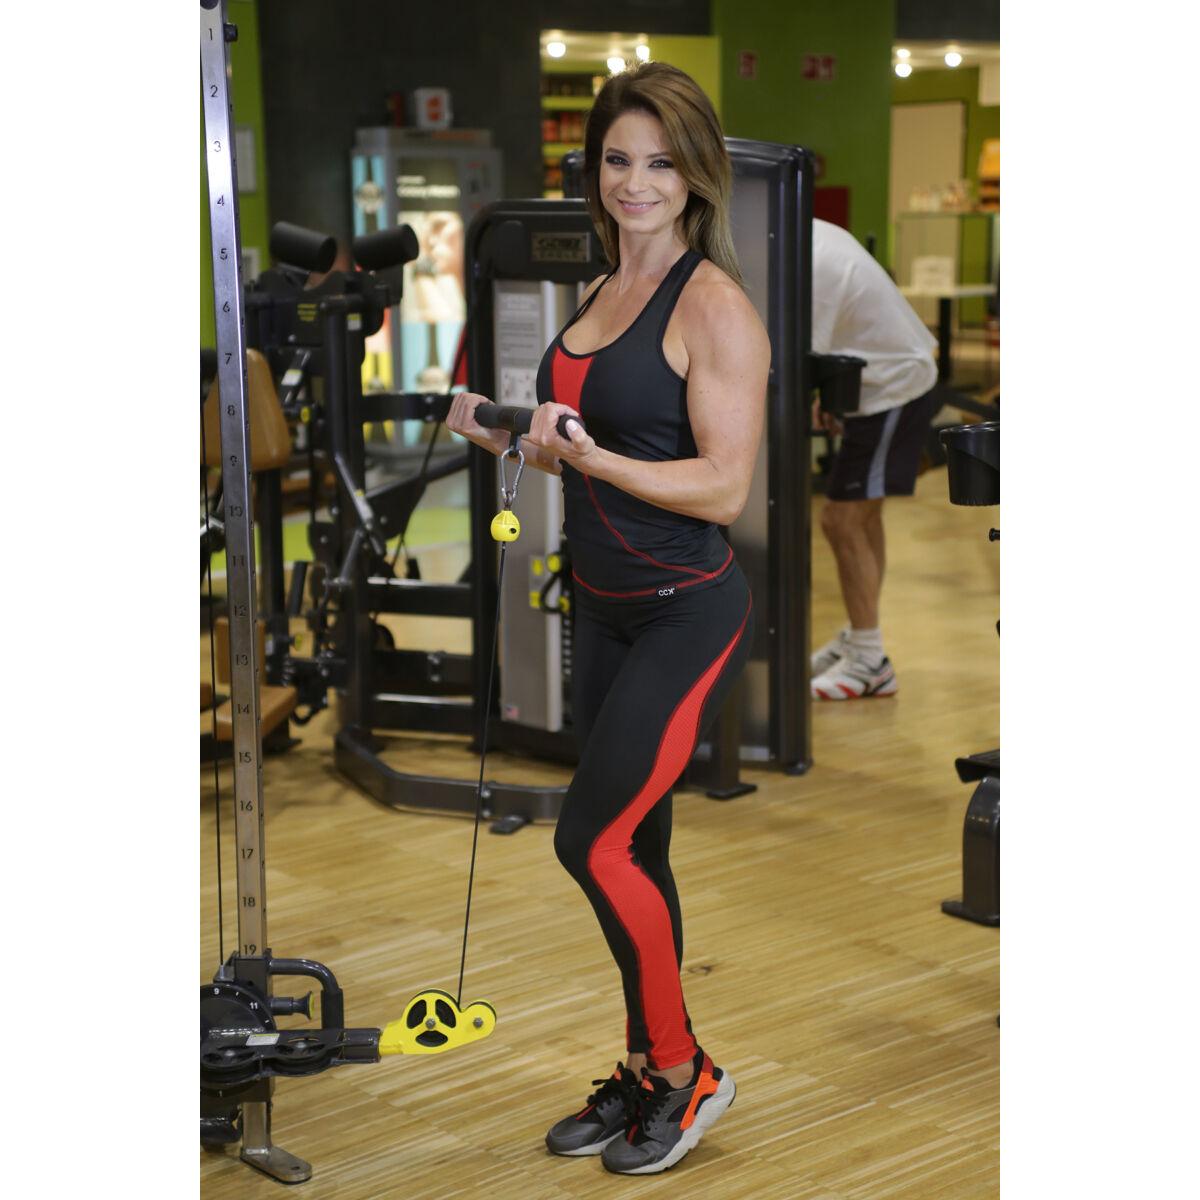 Flame női fitness tüll leggings + atléta szett, fekete-piros